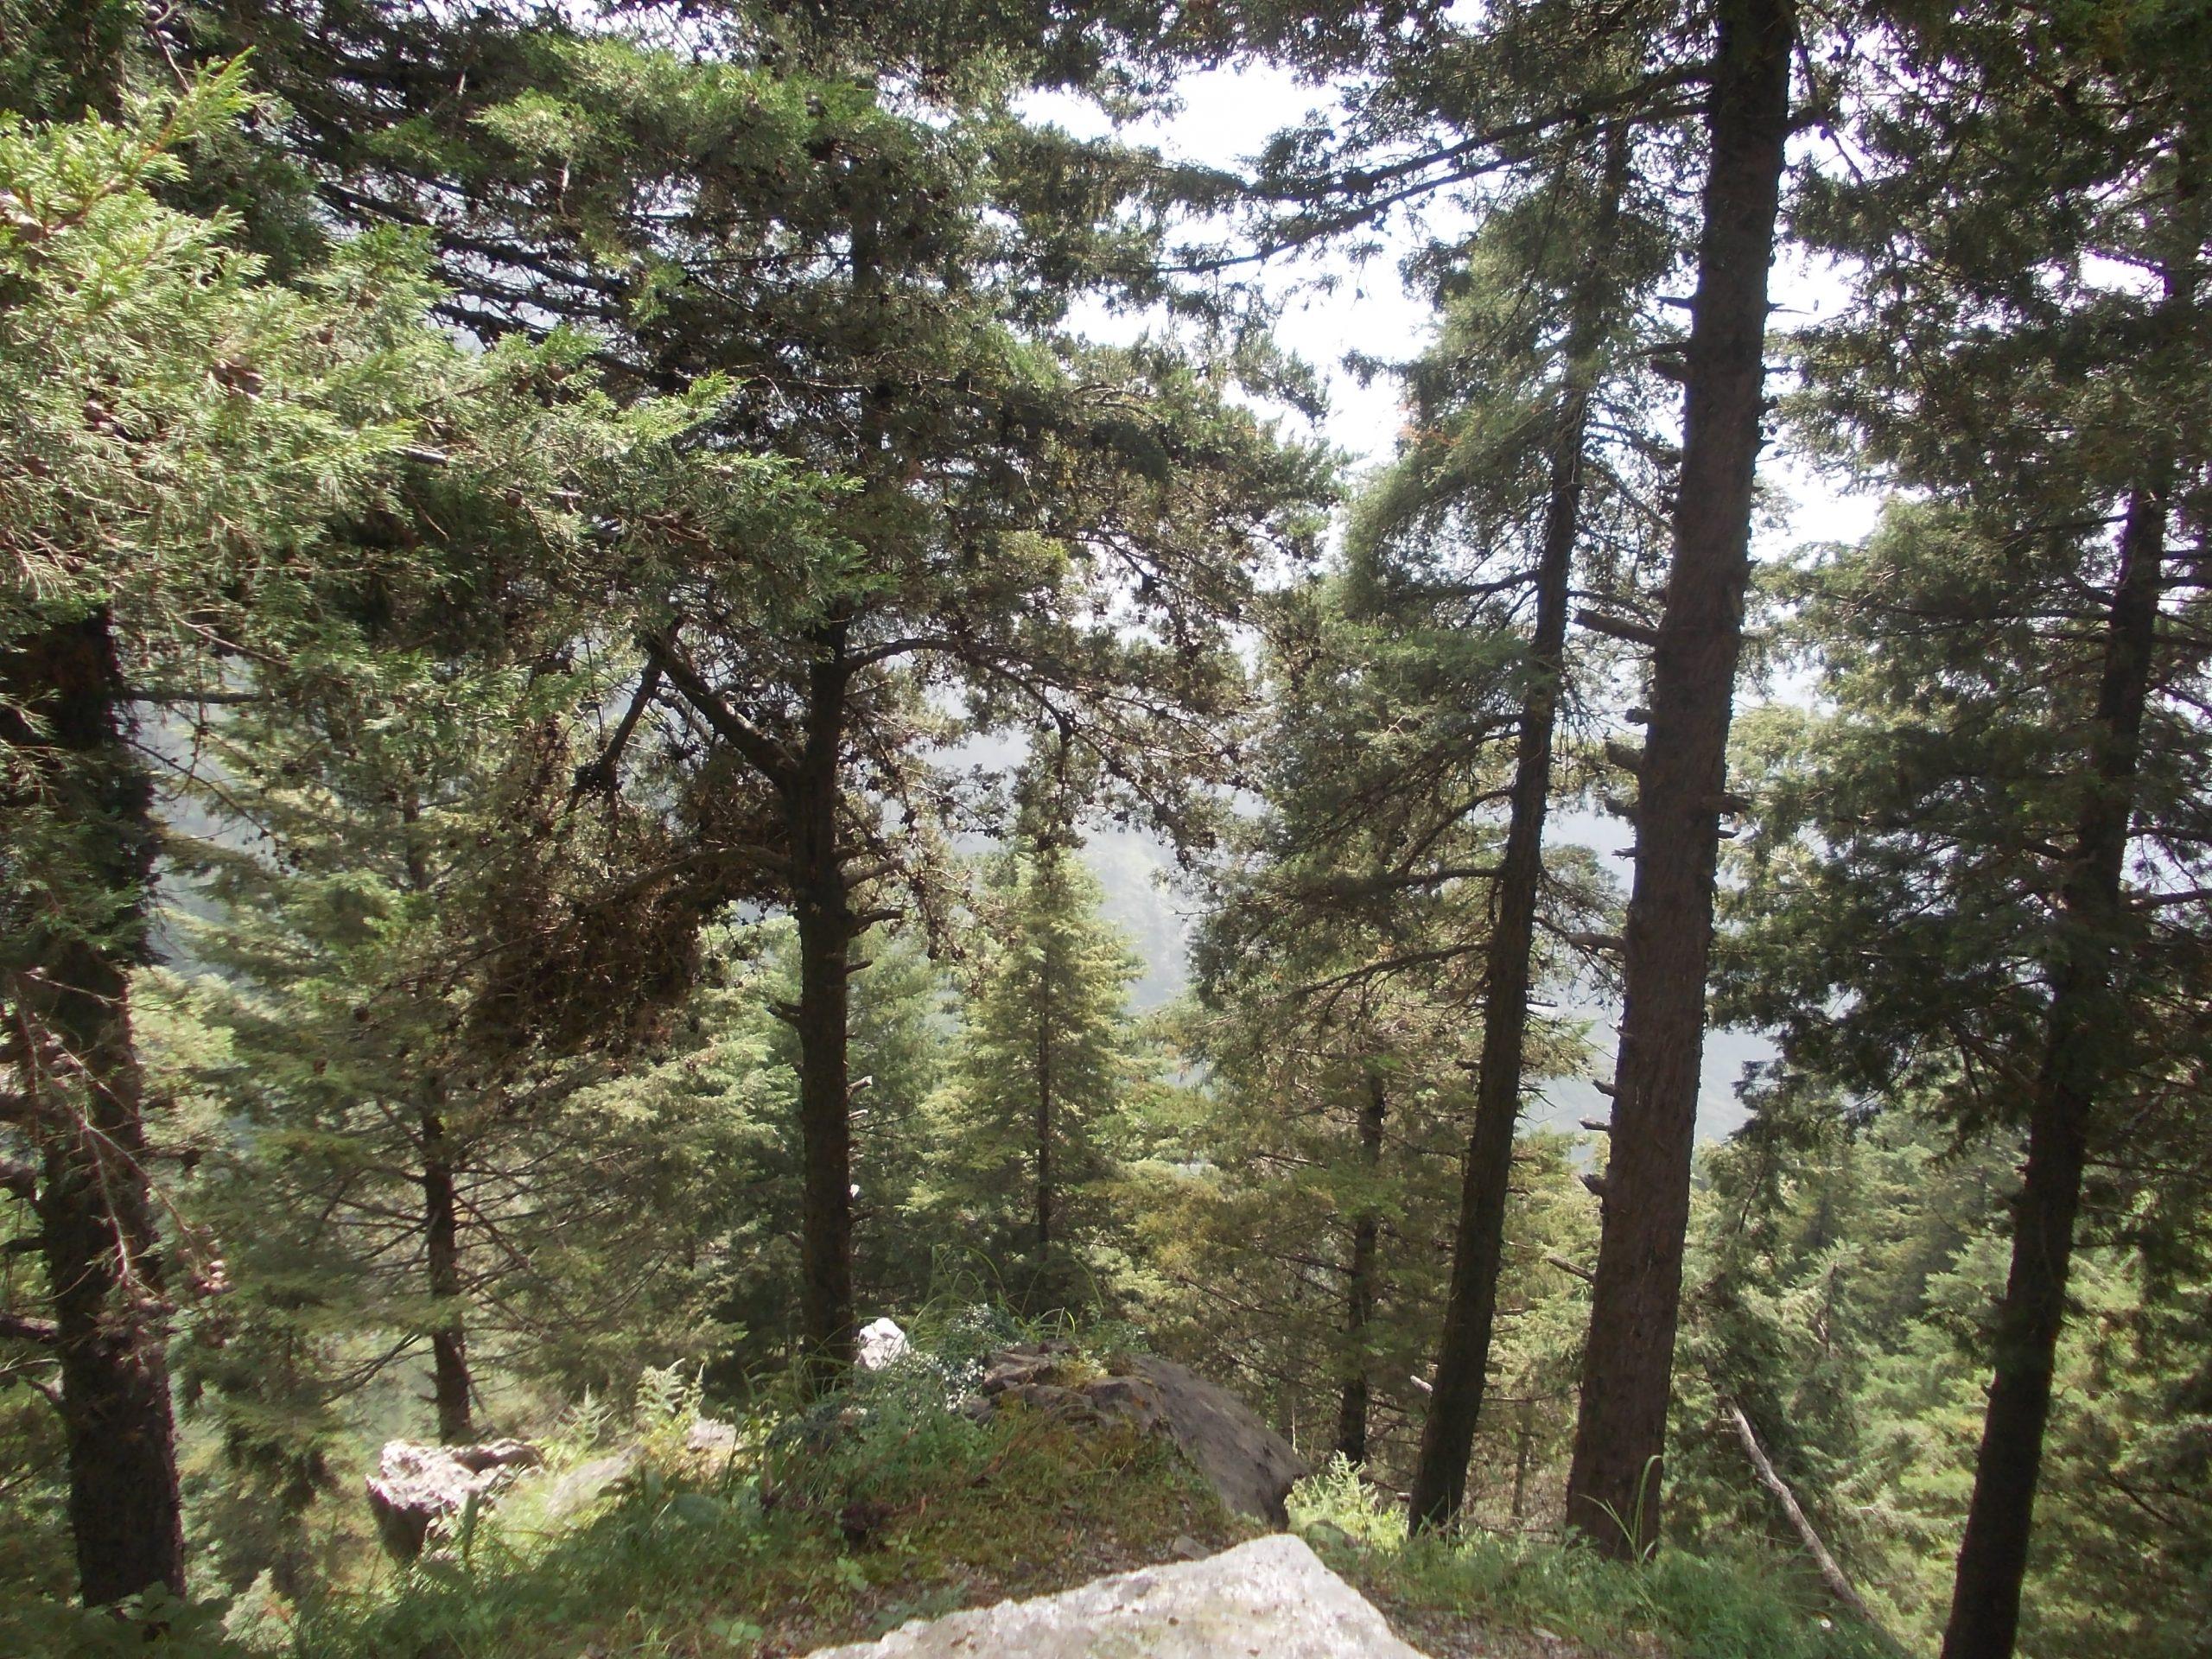 Deodar cedar trees in Mussoorie